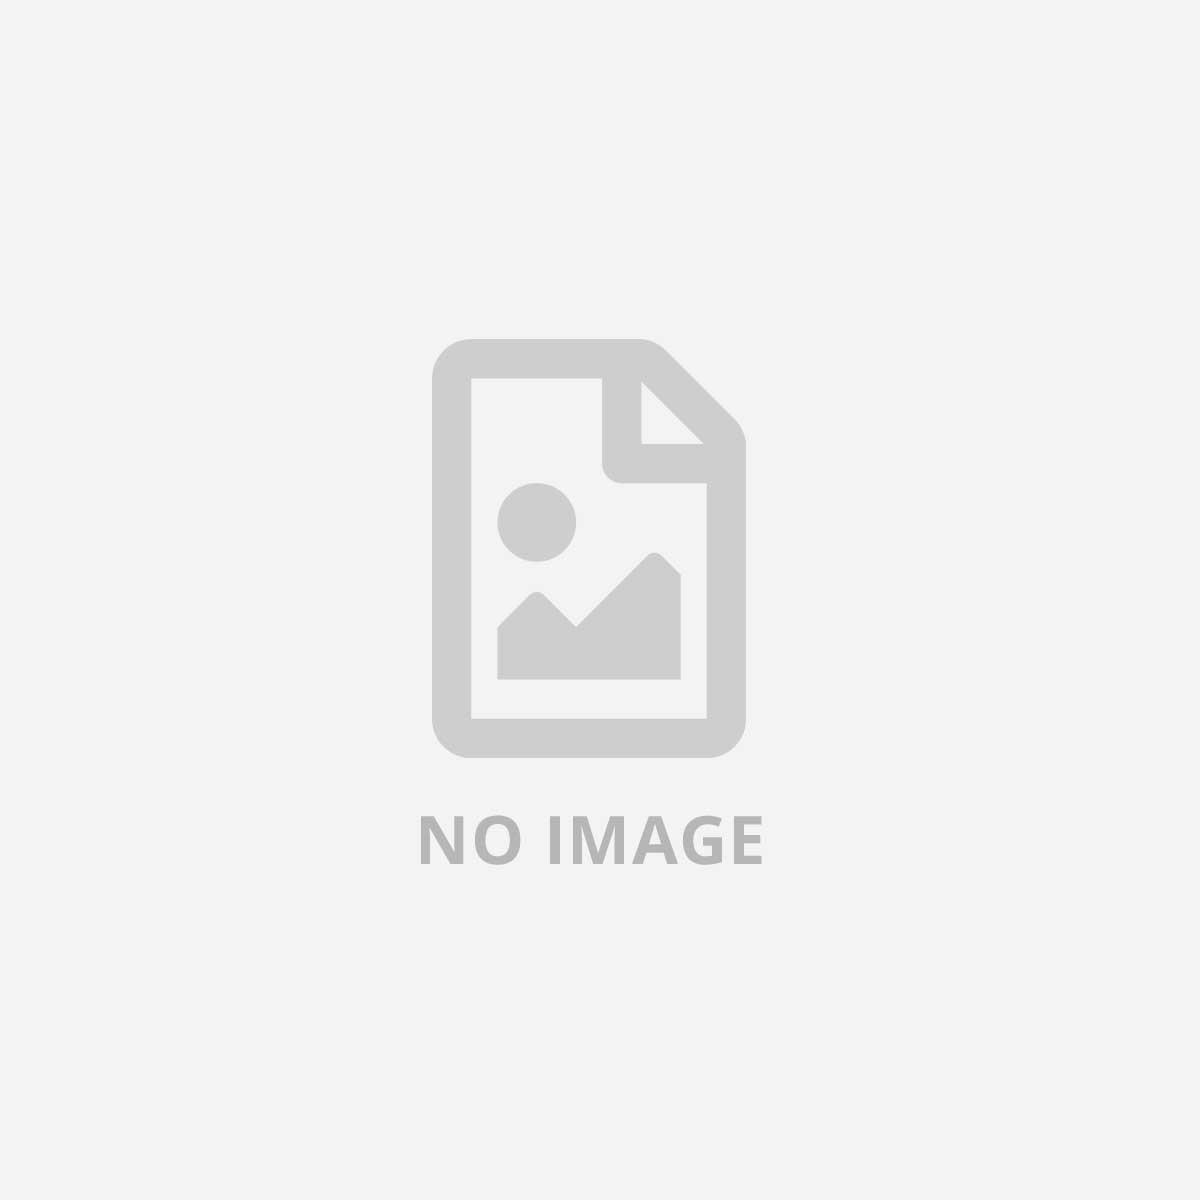 LINDY HUB USB 3.0 INTERNO. 2 PORTE